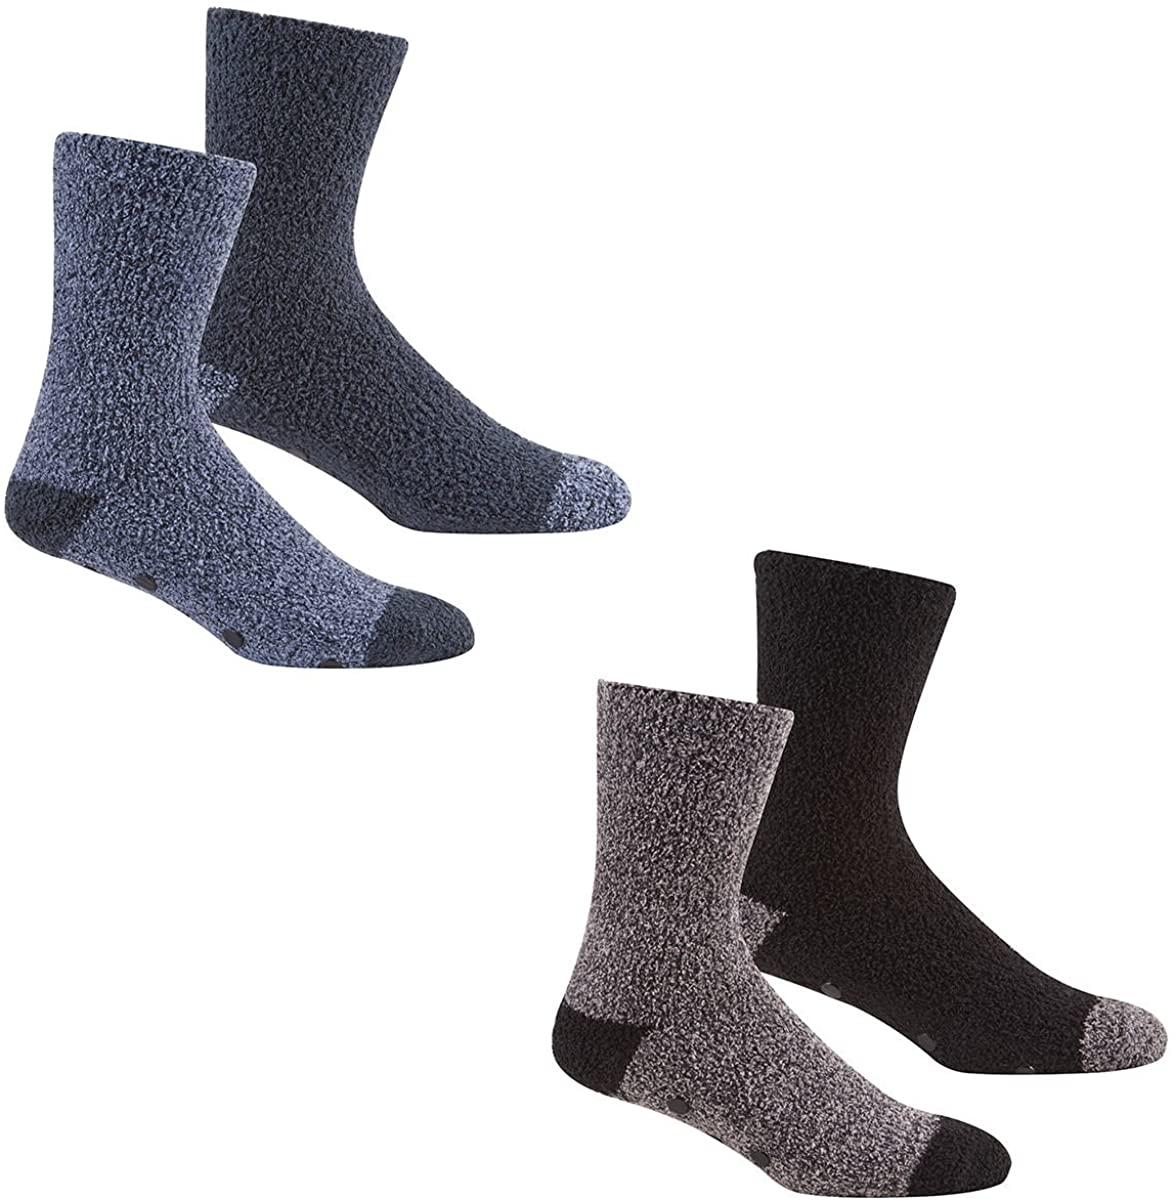 Mens 4 pairs Soft Lounge Socks with Gripper Soles/Slipper Socks